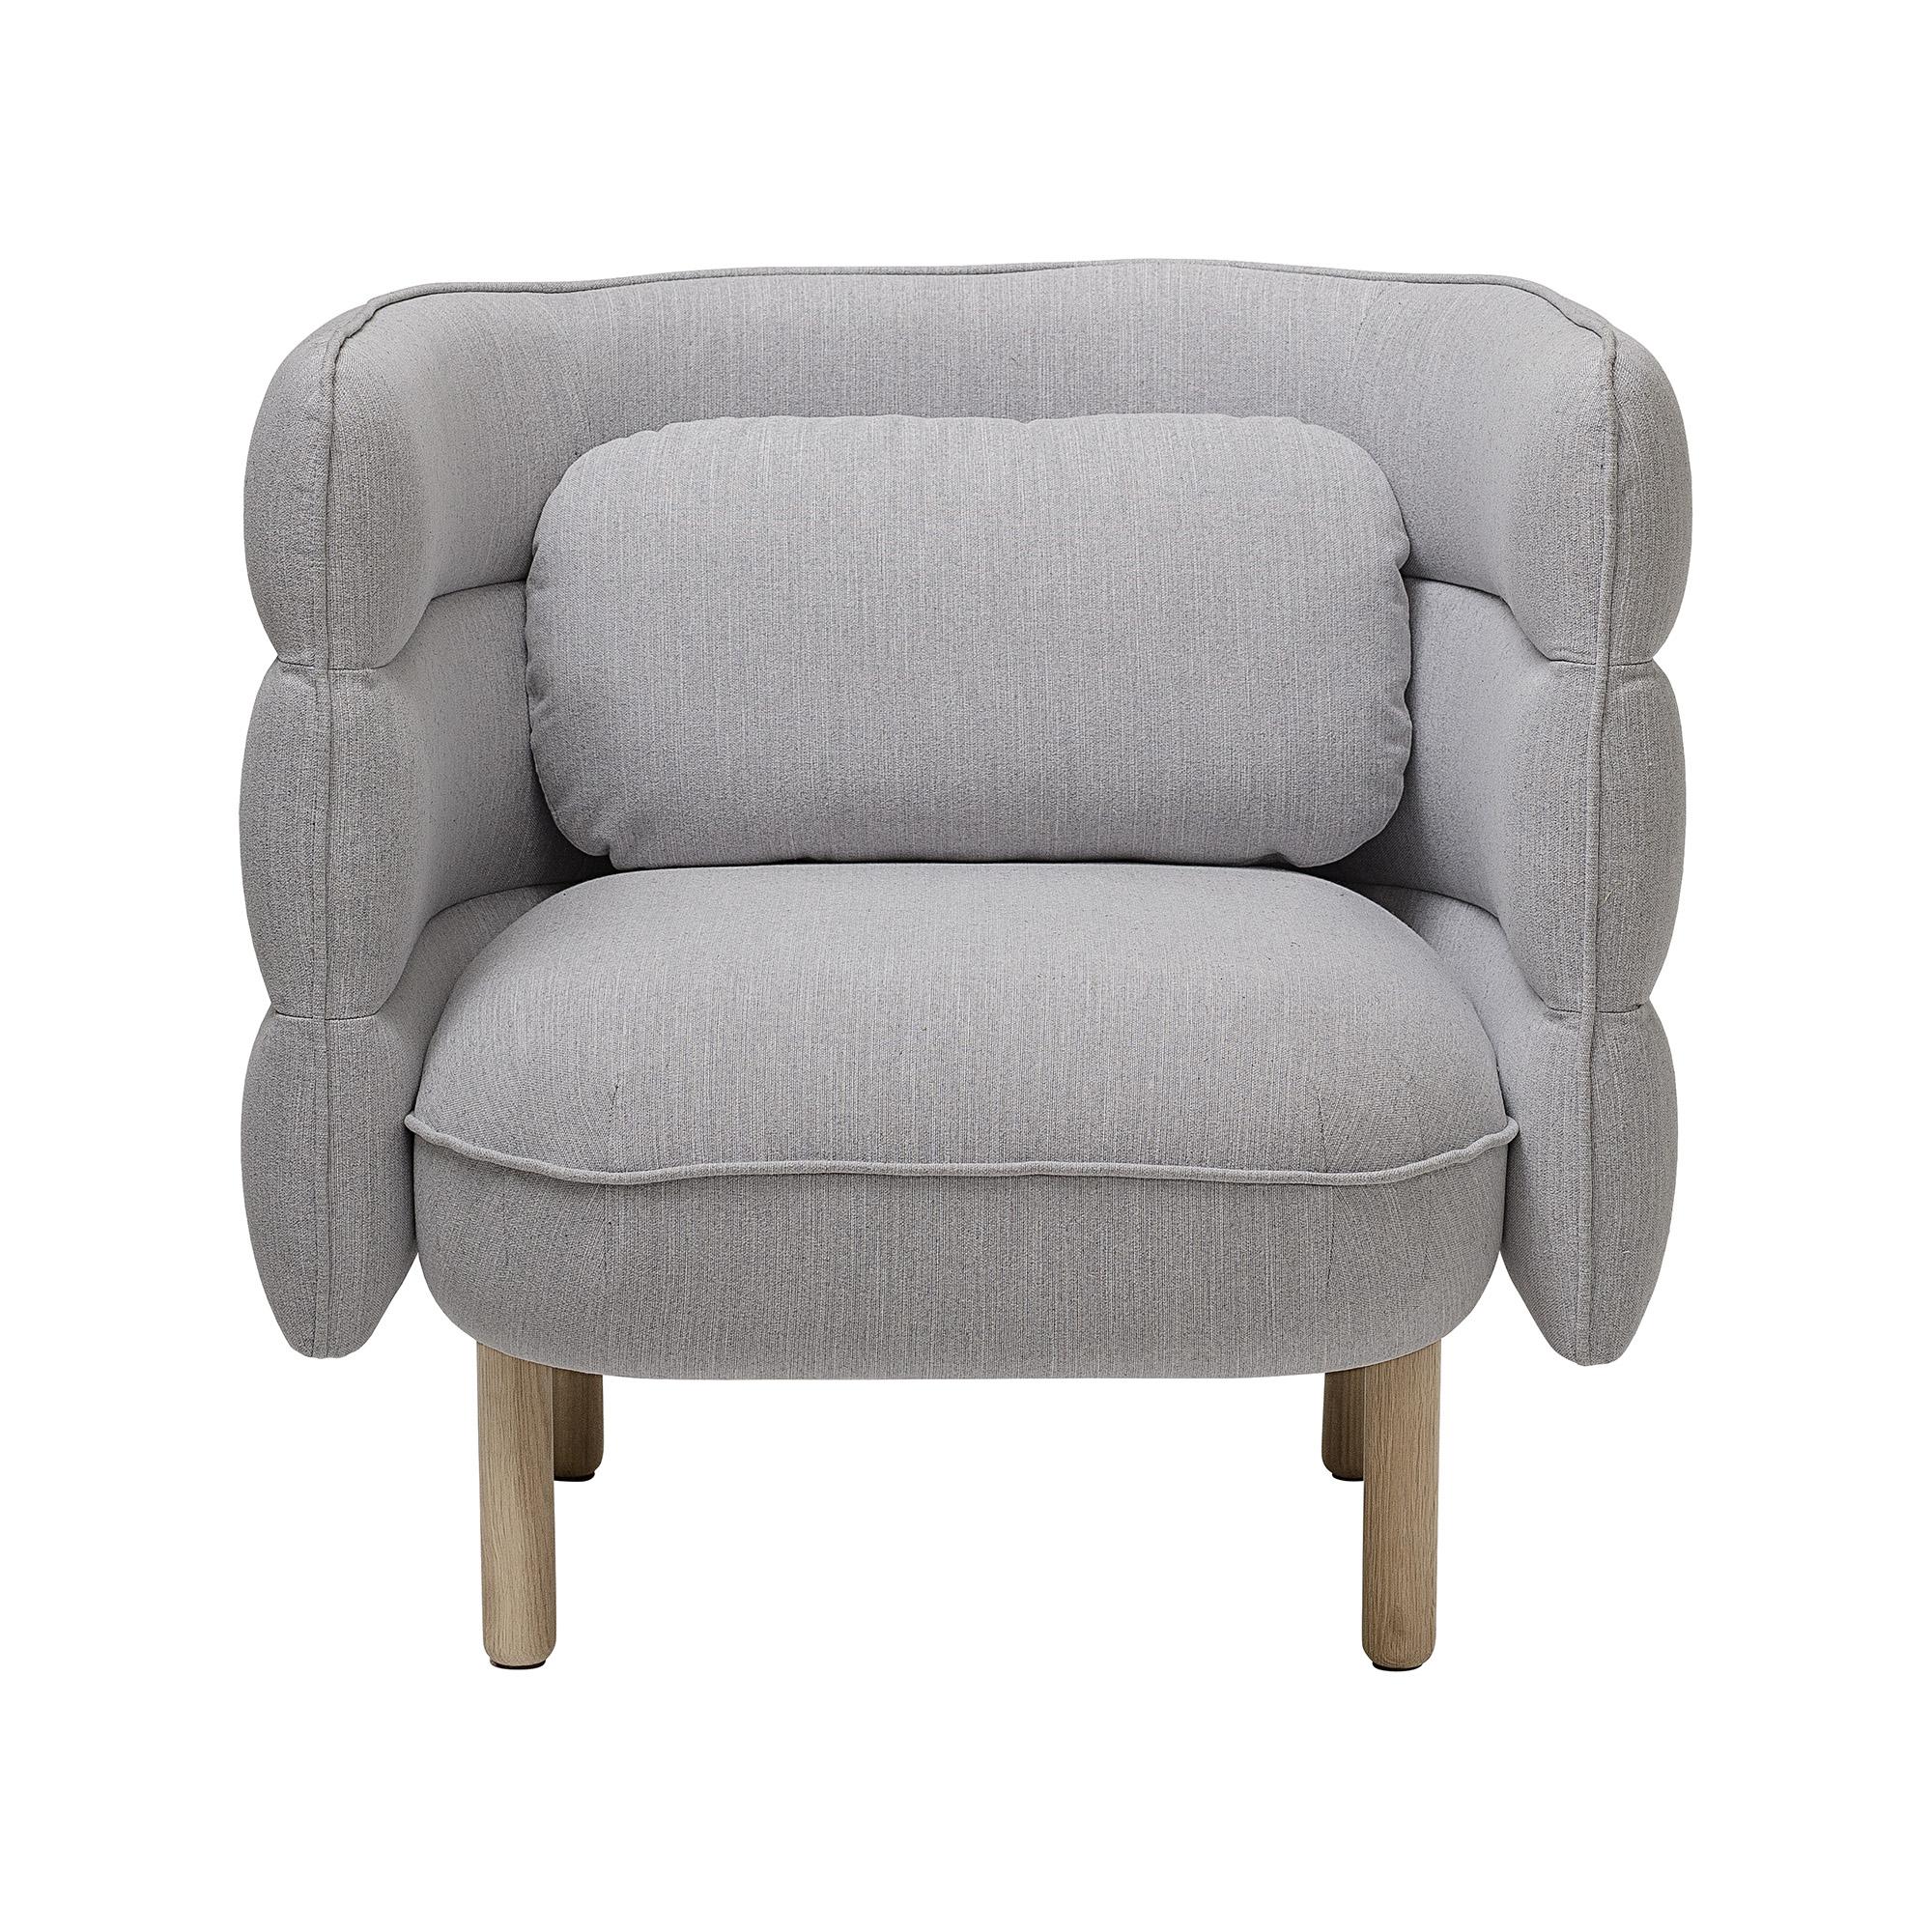 Image of   Bloomingville Ellen Stol polyester - grå